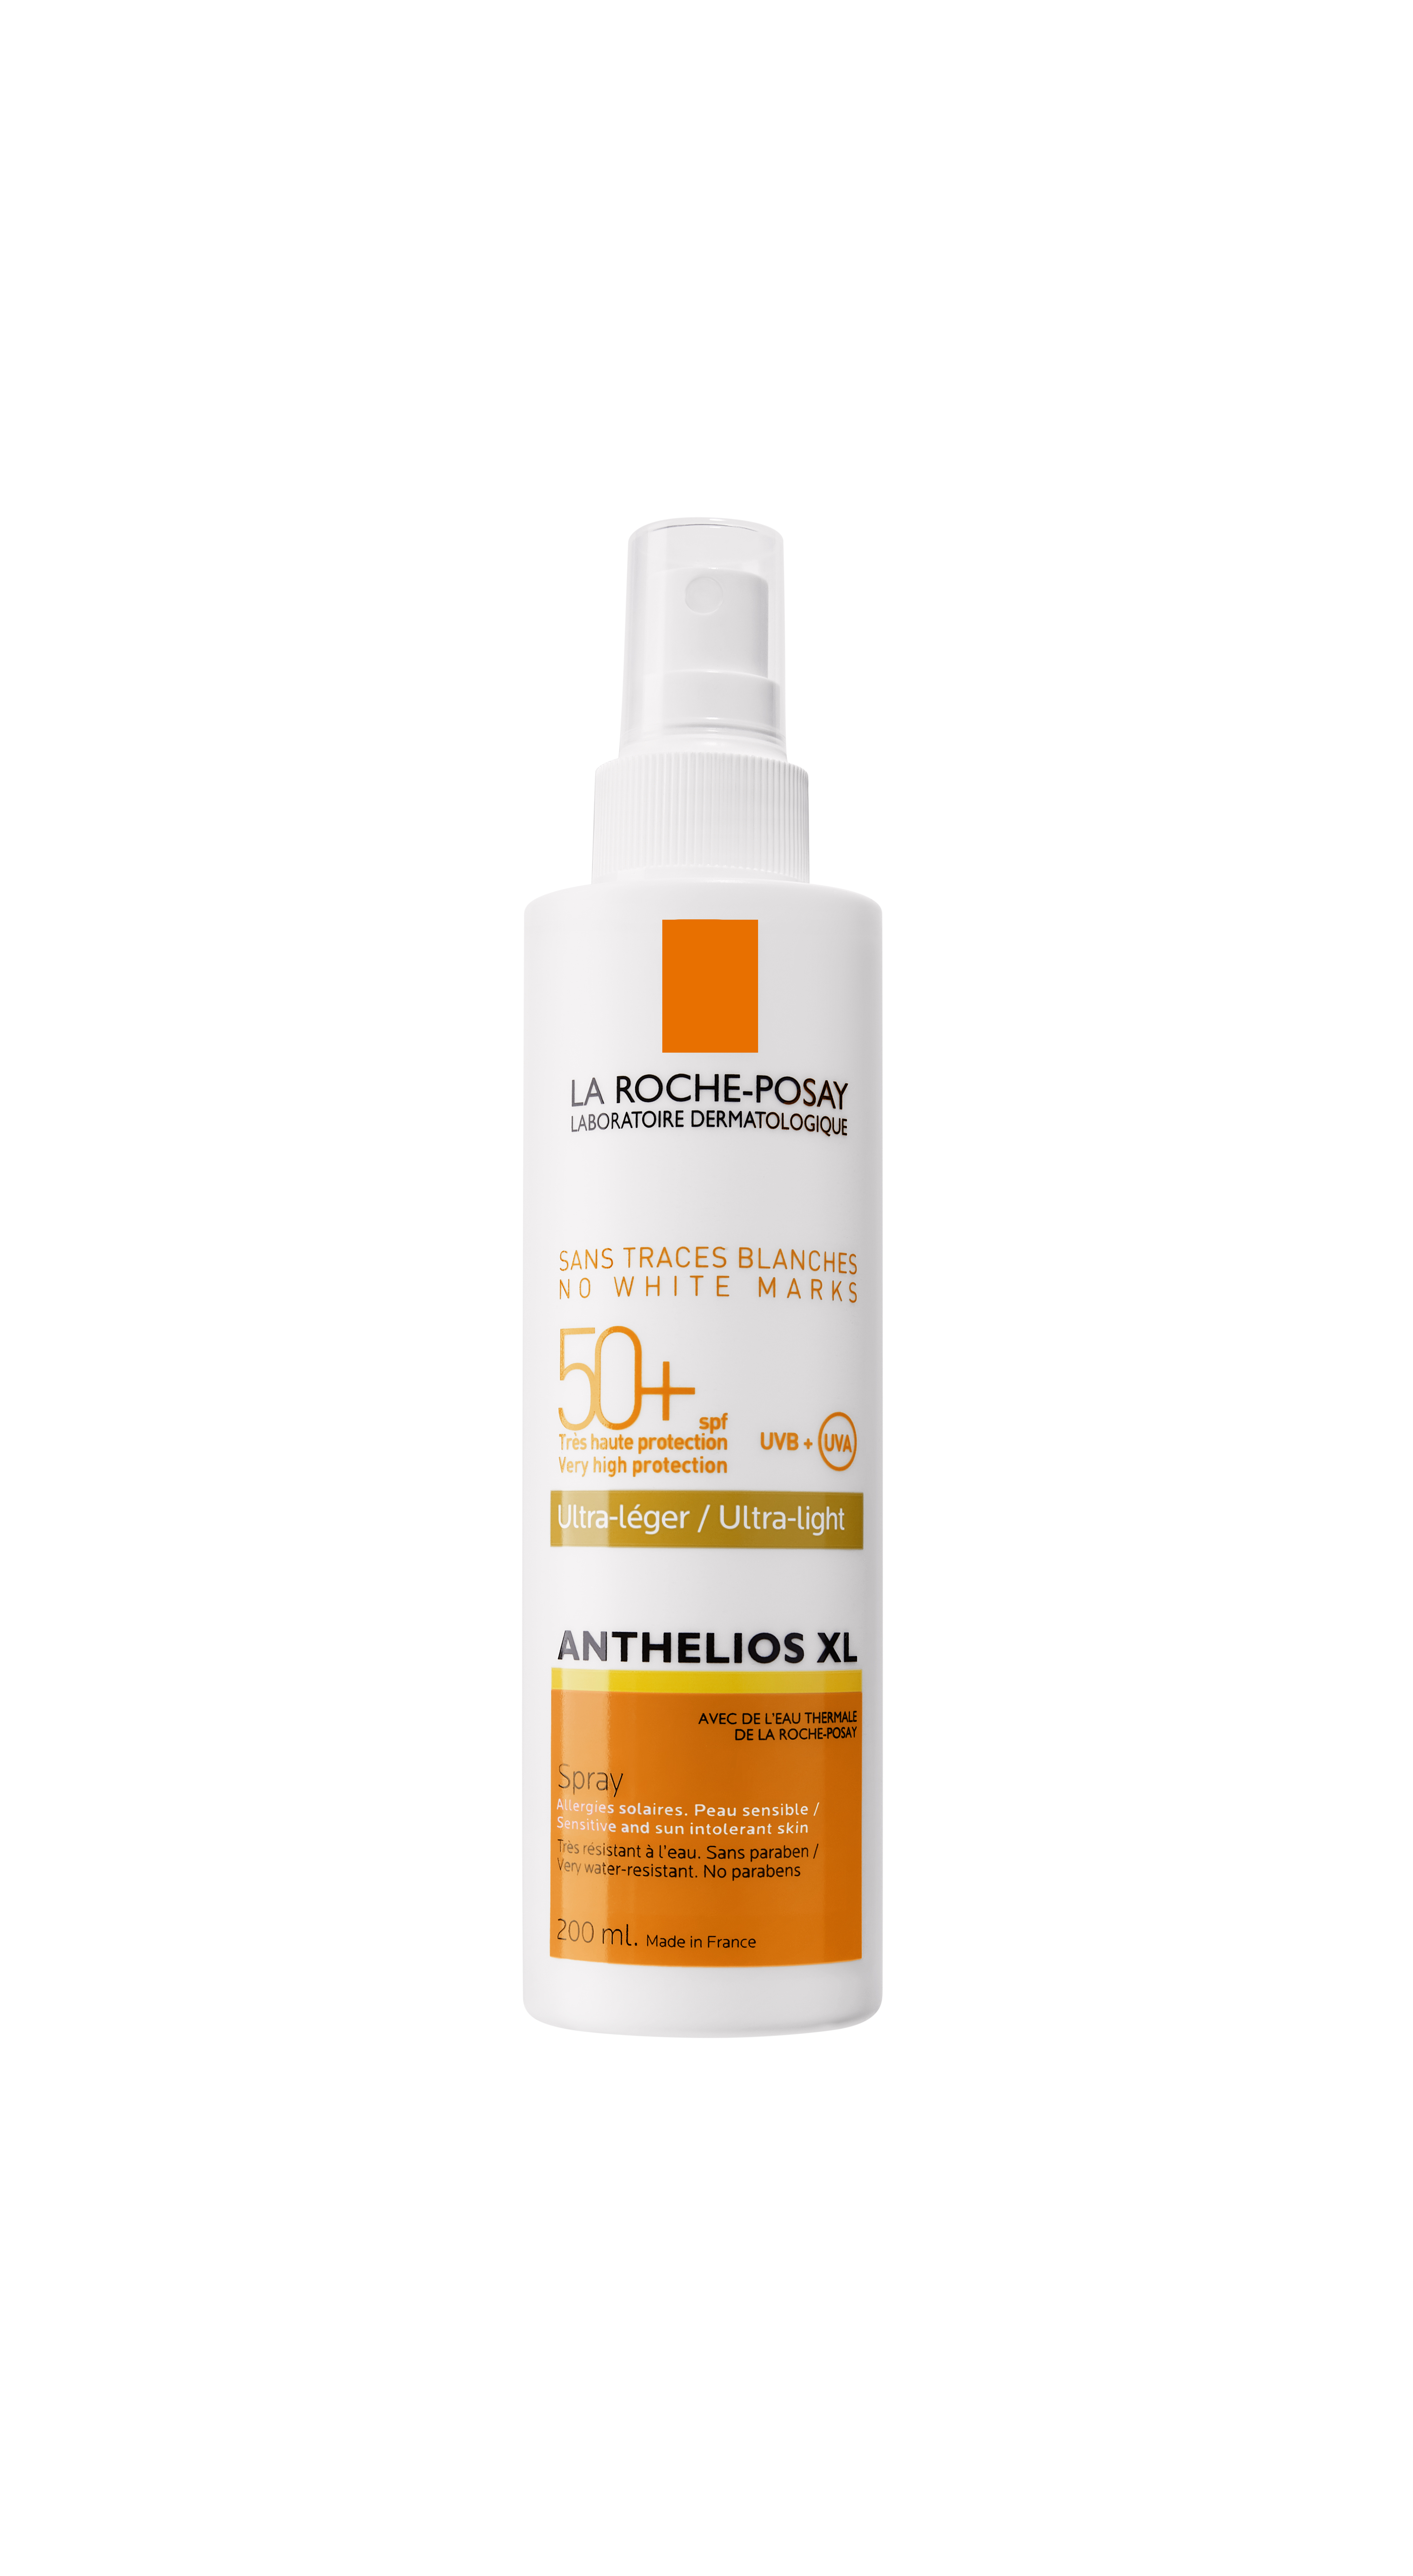 Anthelios Creme Solaire En Spray Corps Spf 50 Avec Parfum 200 Ml